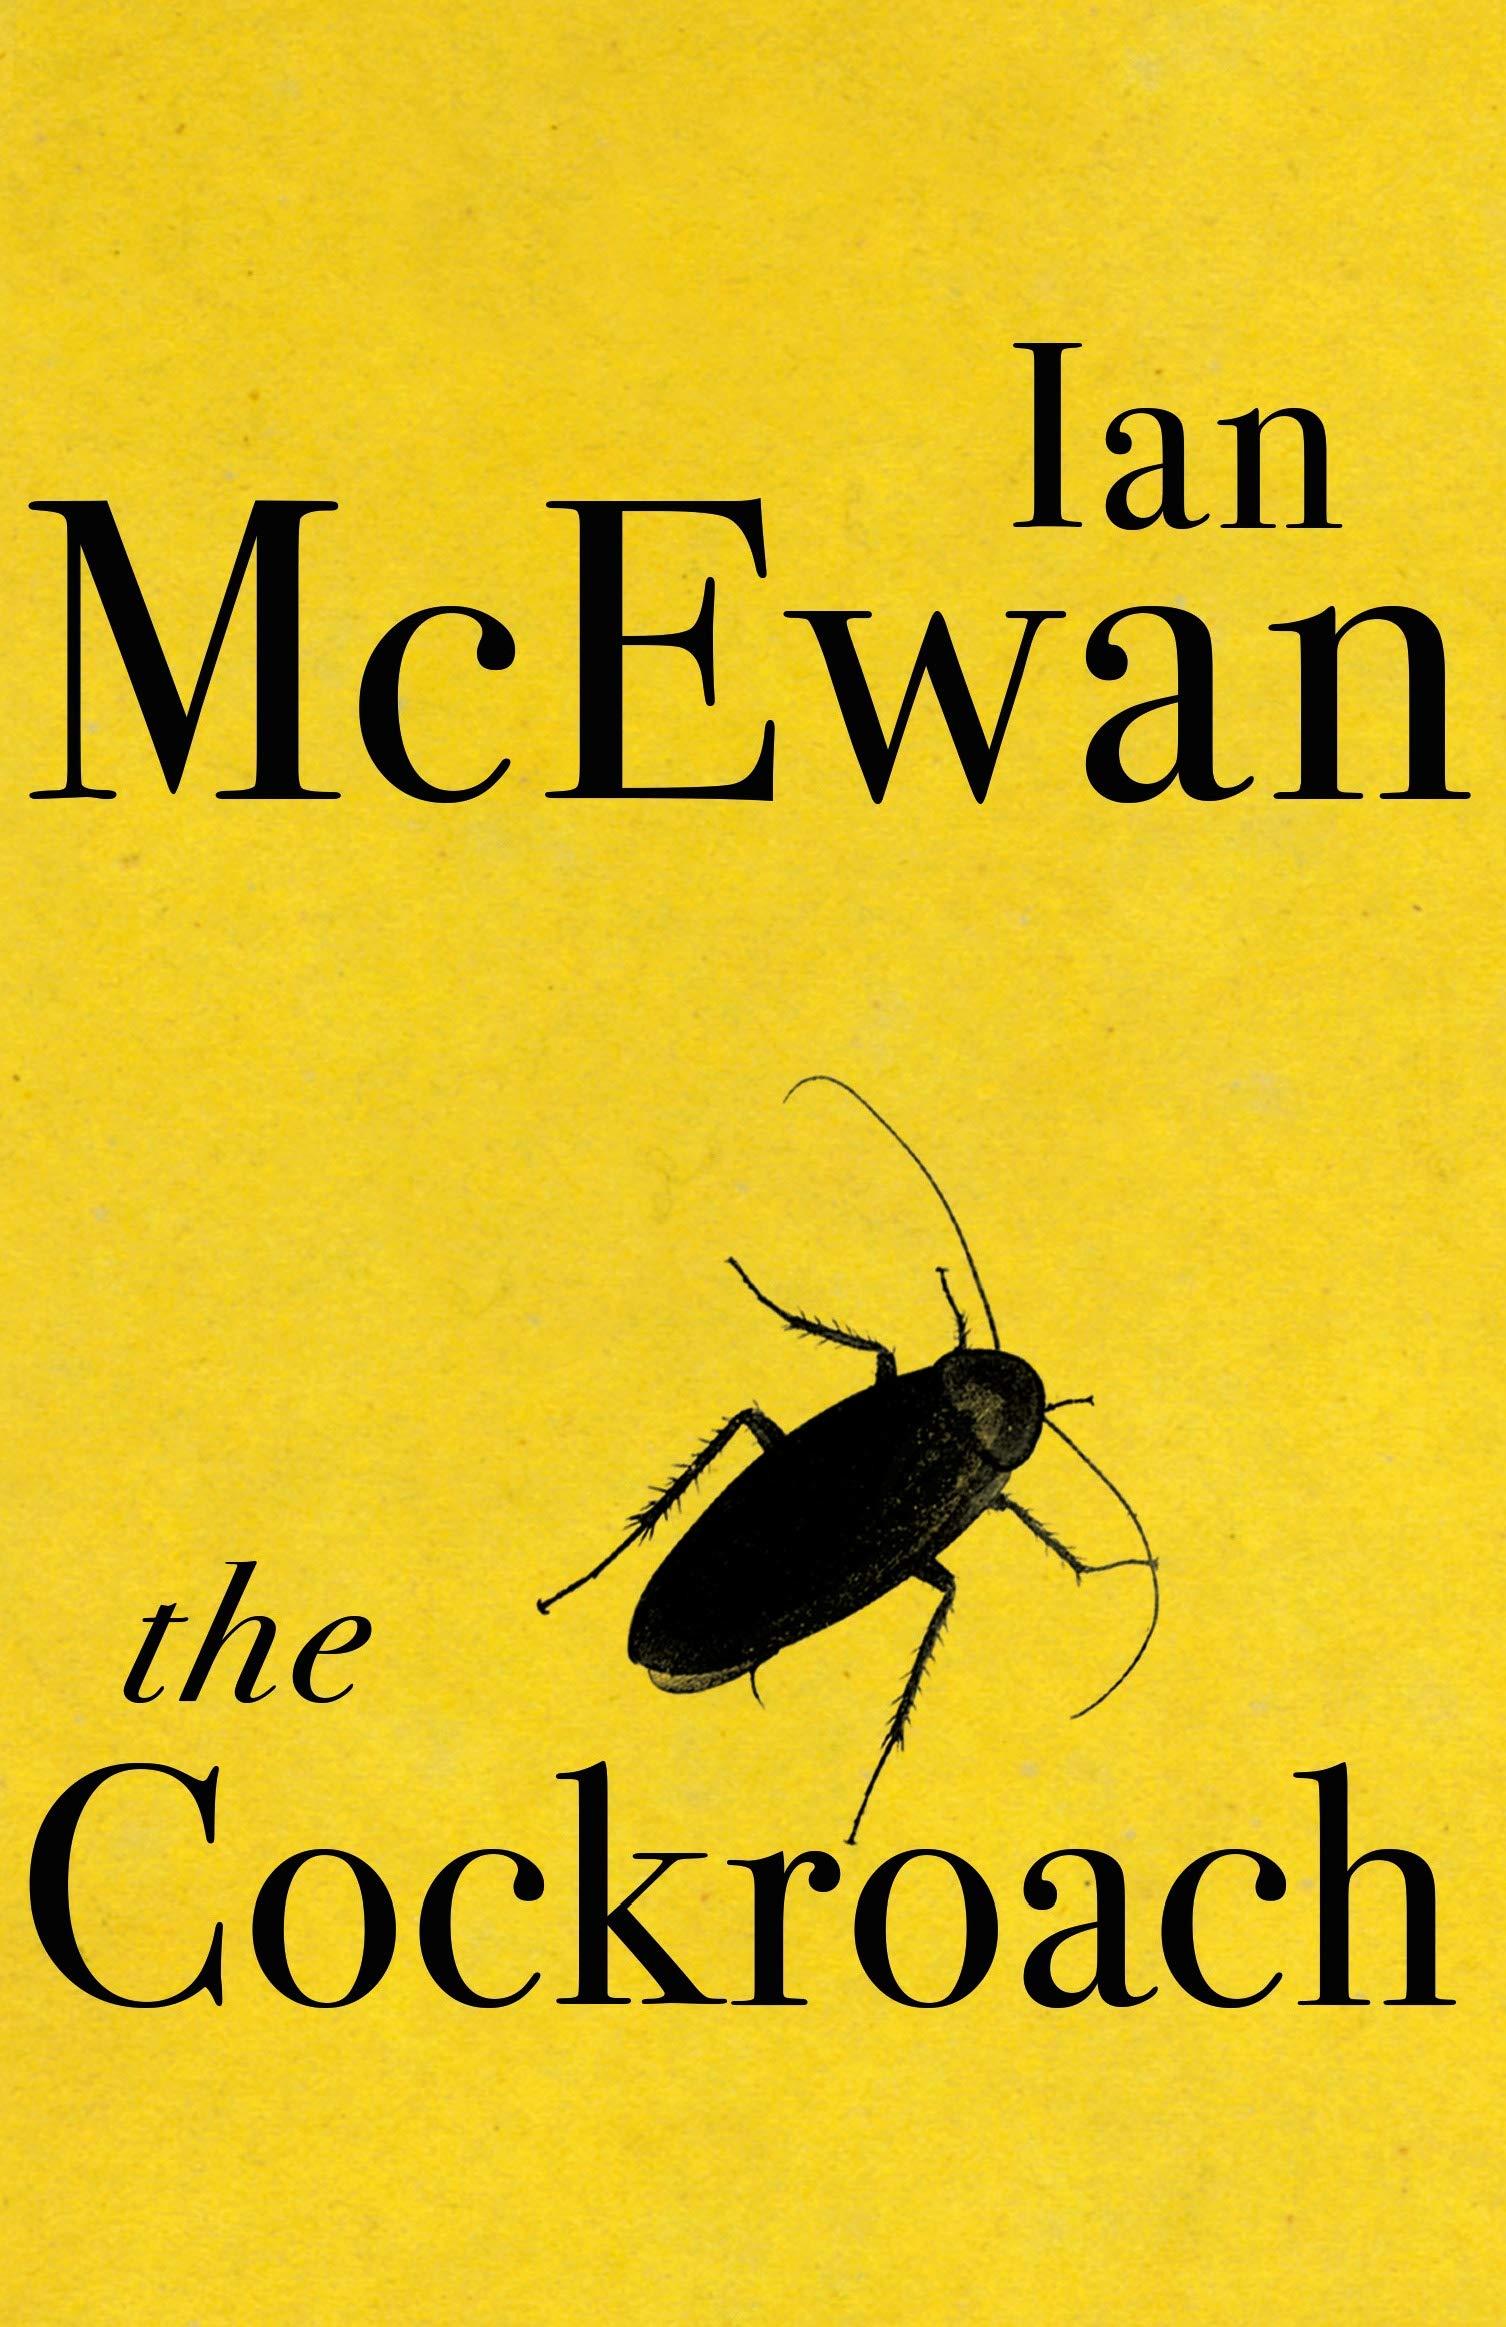 Ian McEwan - Cockroach